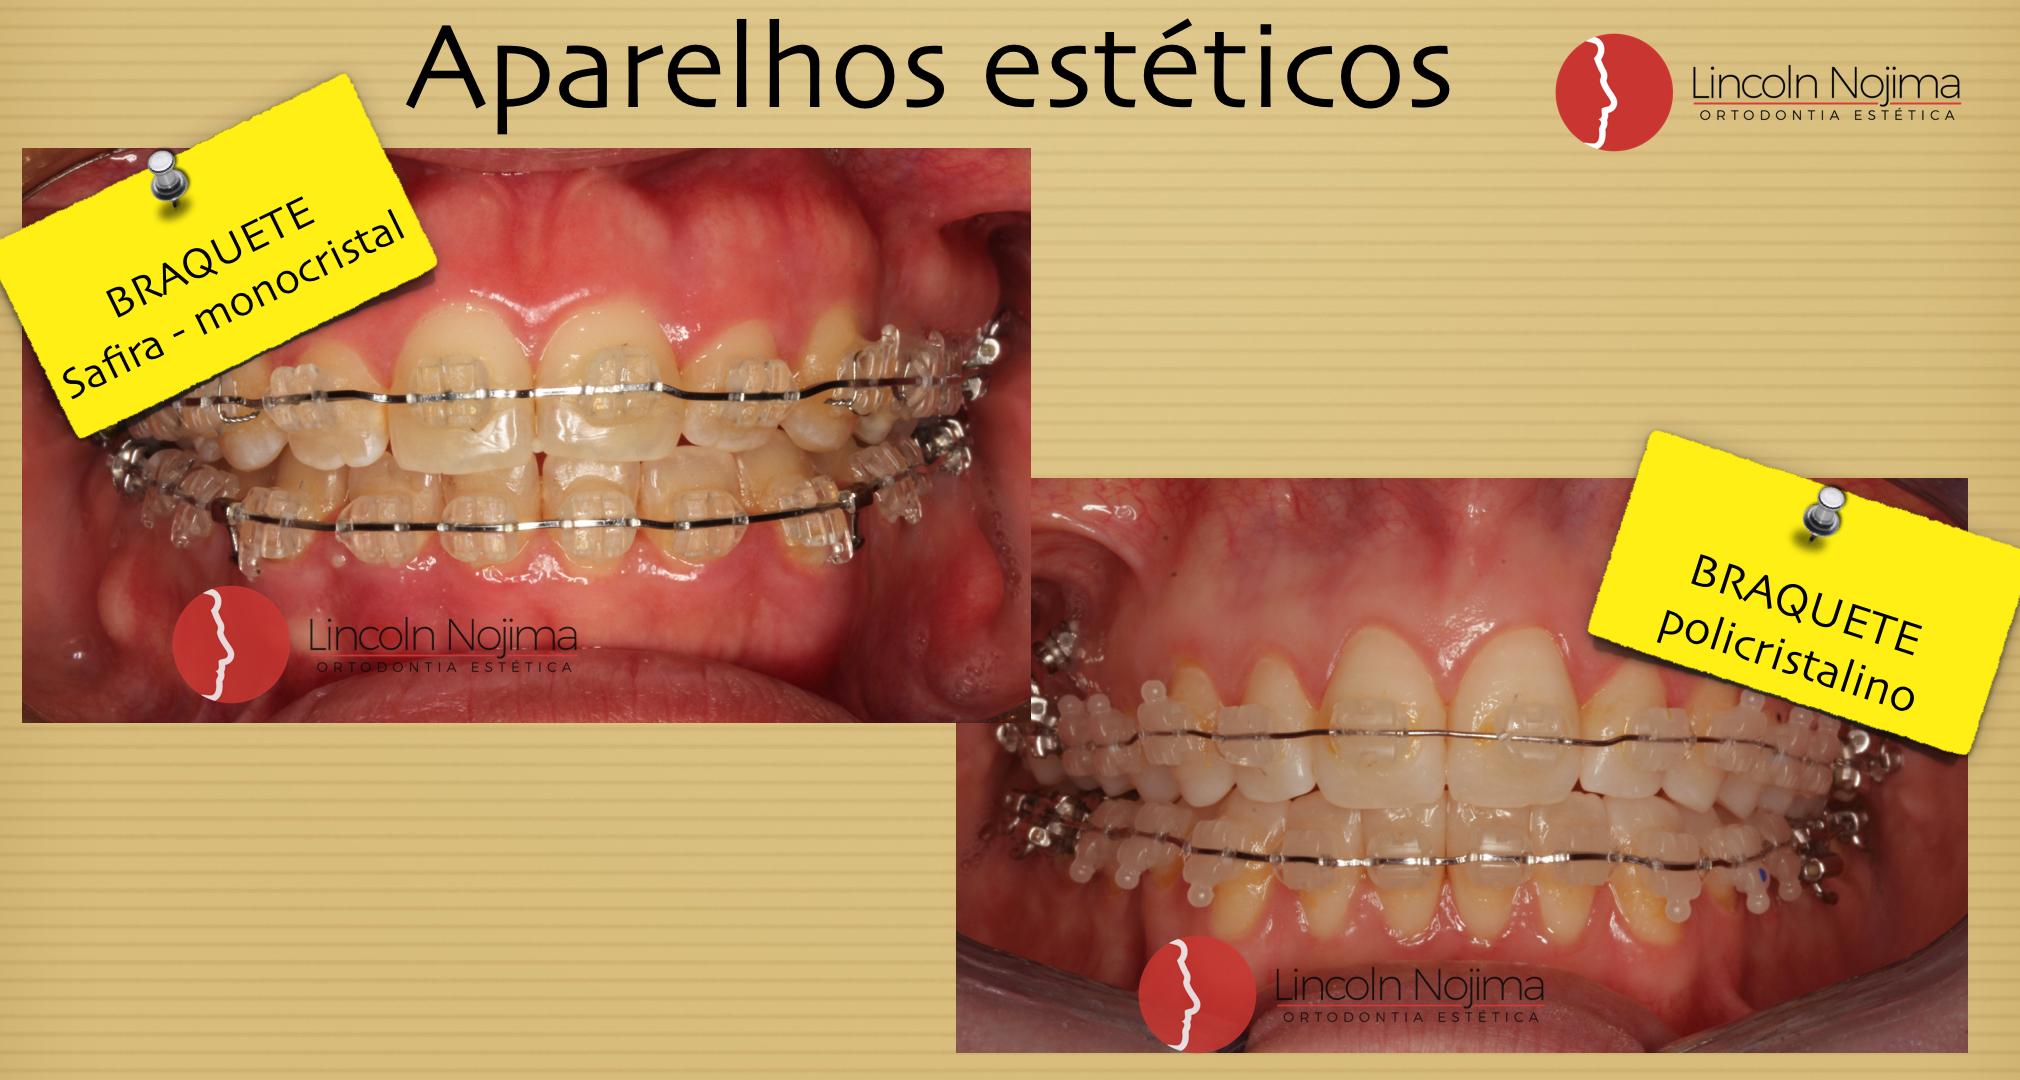 fotos.008 (2)